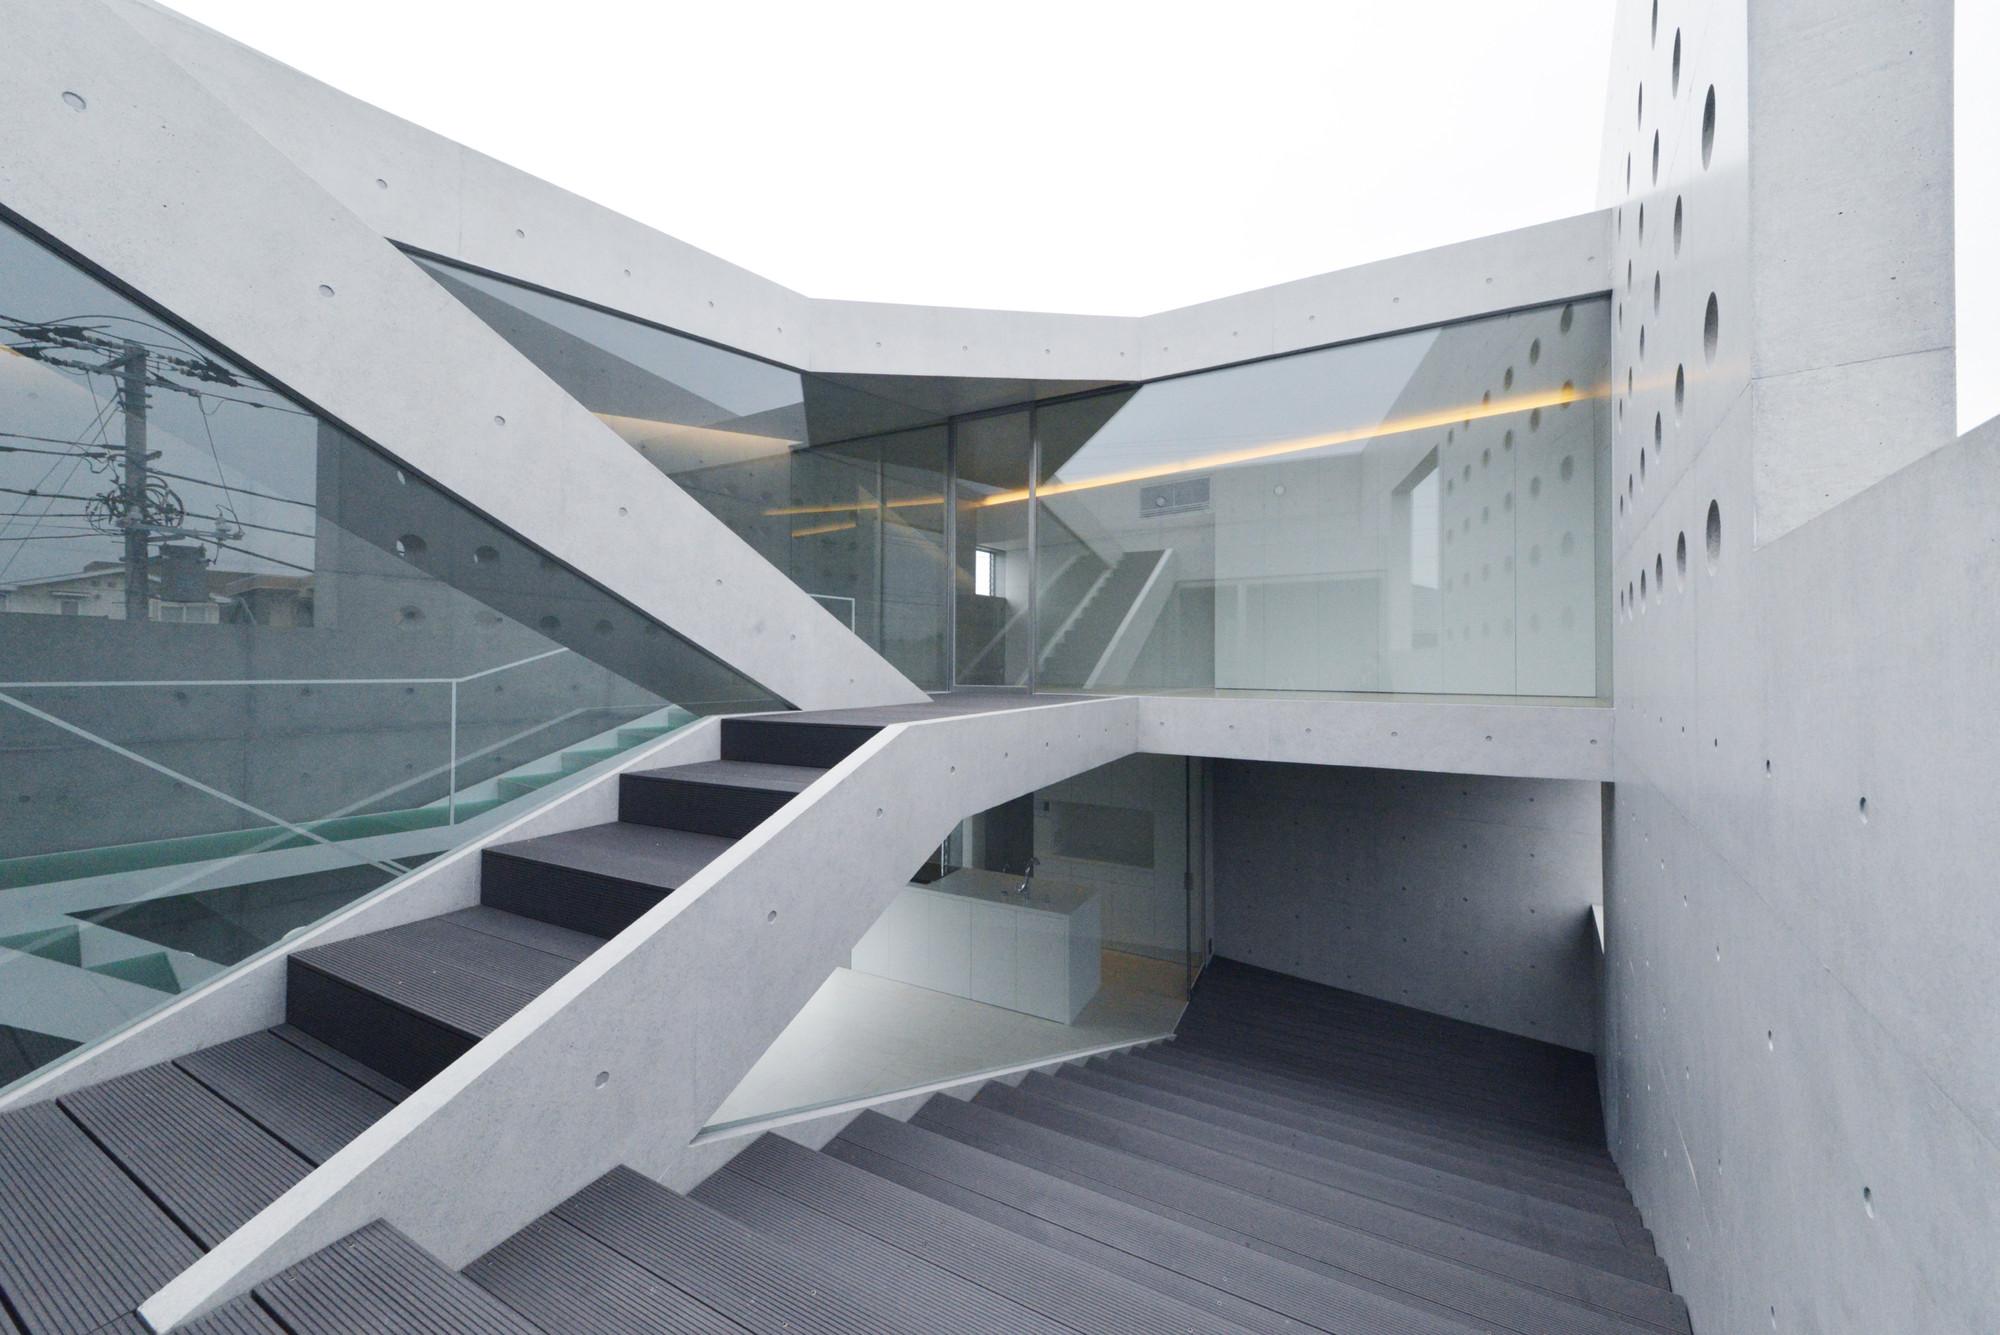 Casa en Tsudanuma / fuse-atelier, © Shigeru Fuse